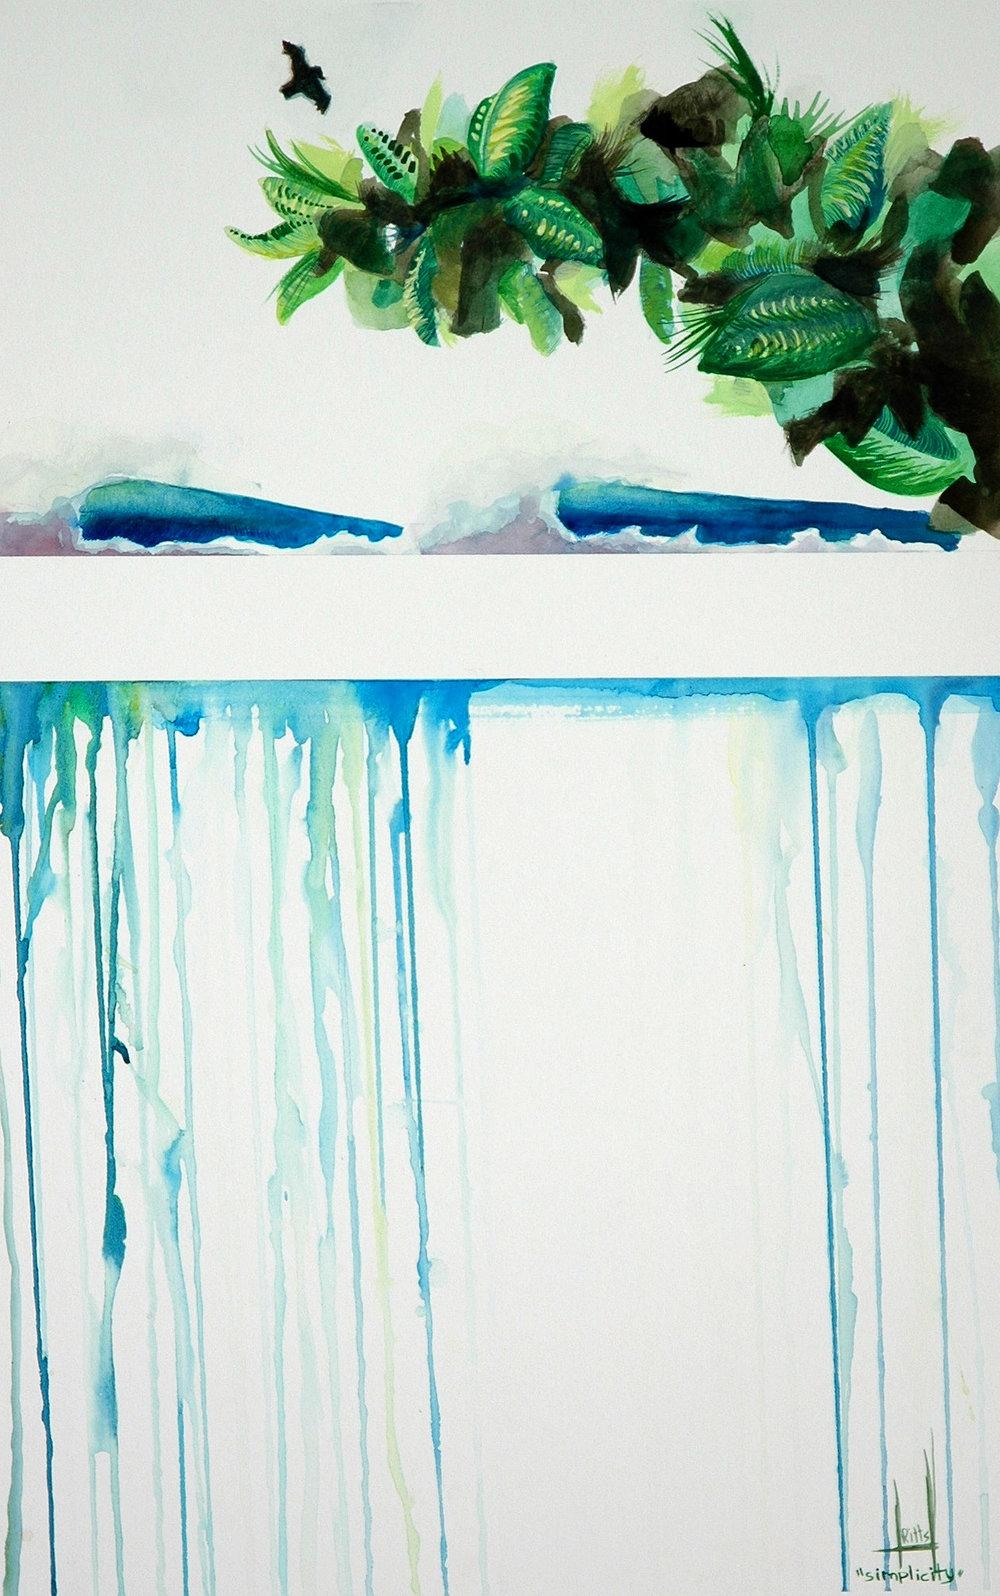 """Simplicity"" Watercolor on Illustration Board"